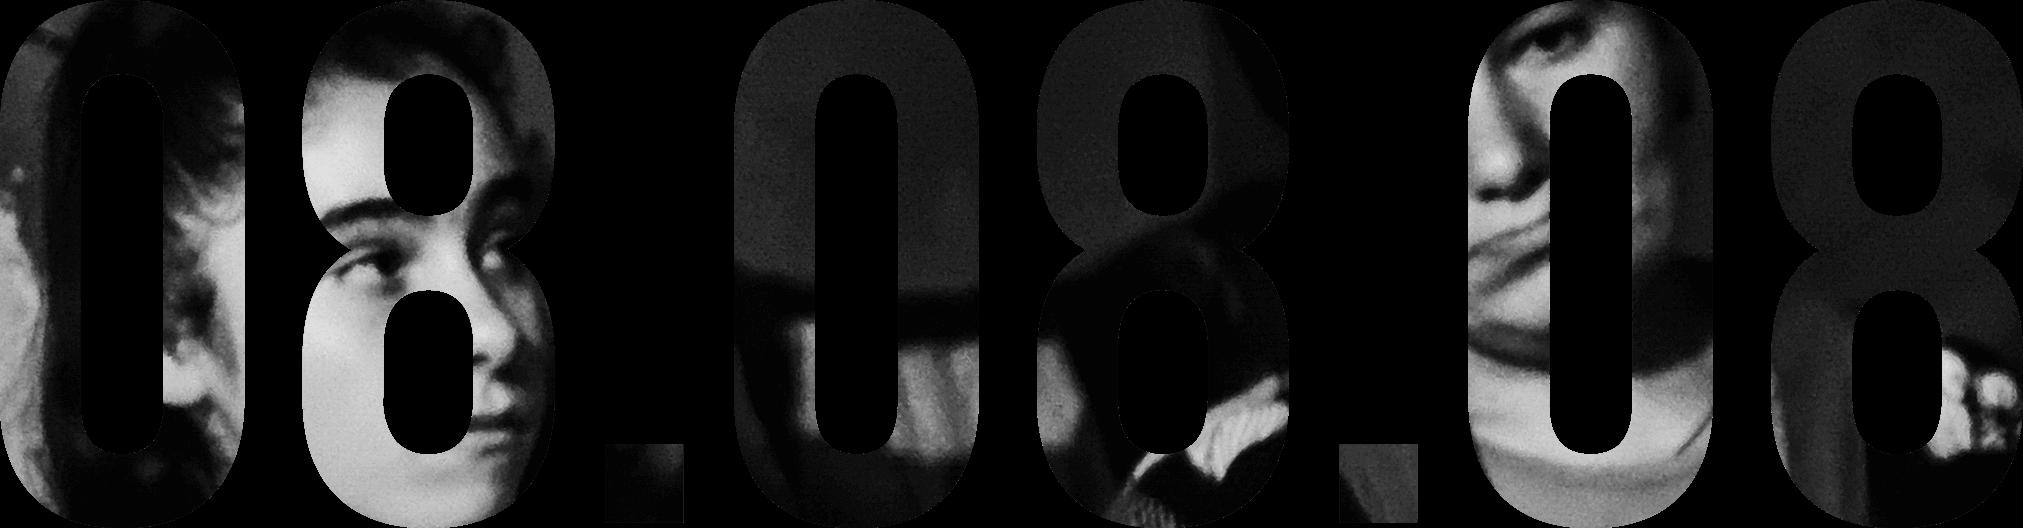 08 >> 08 08 08